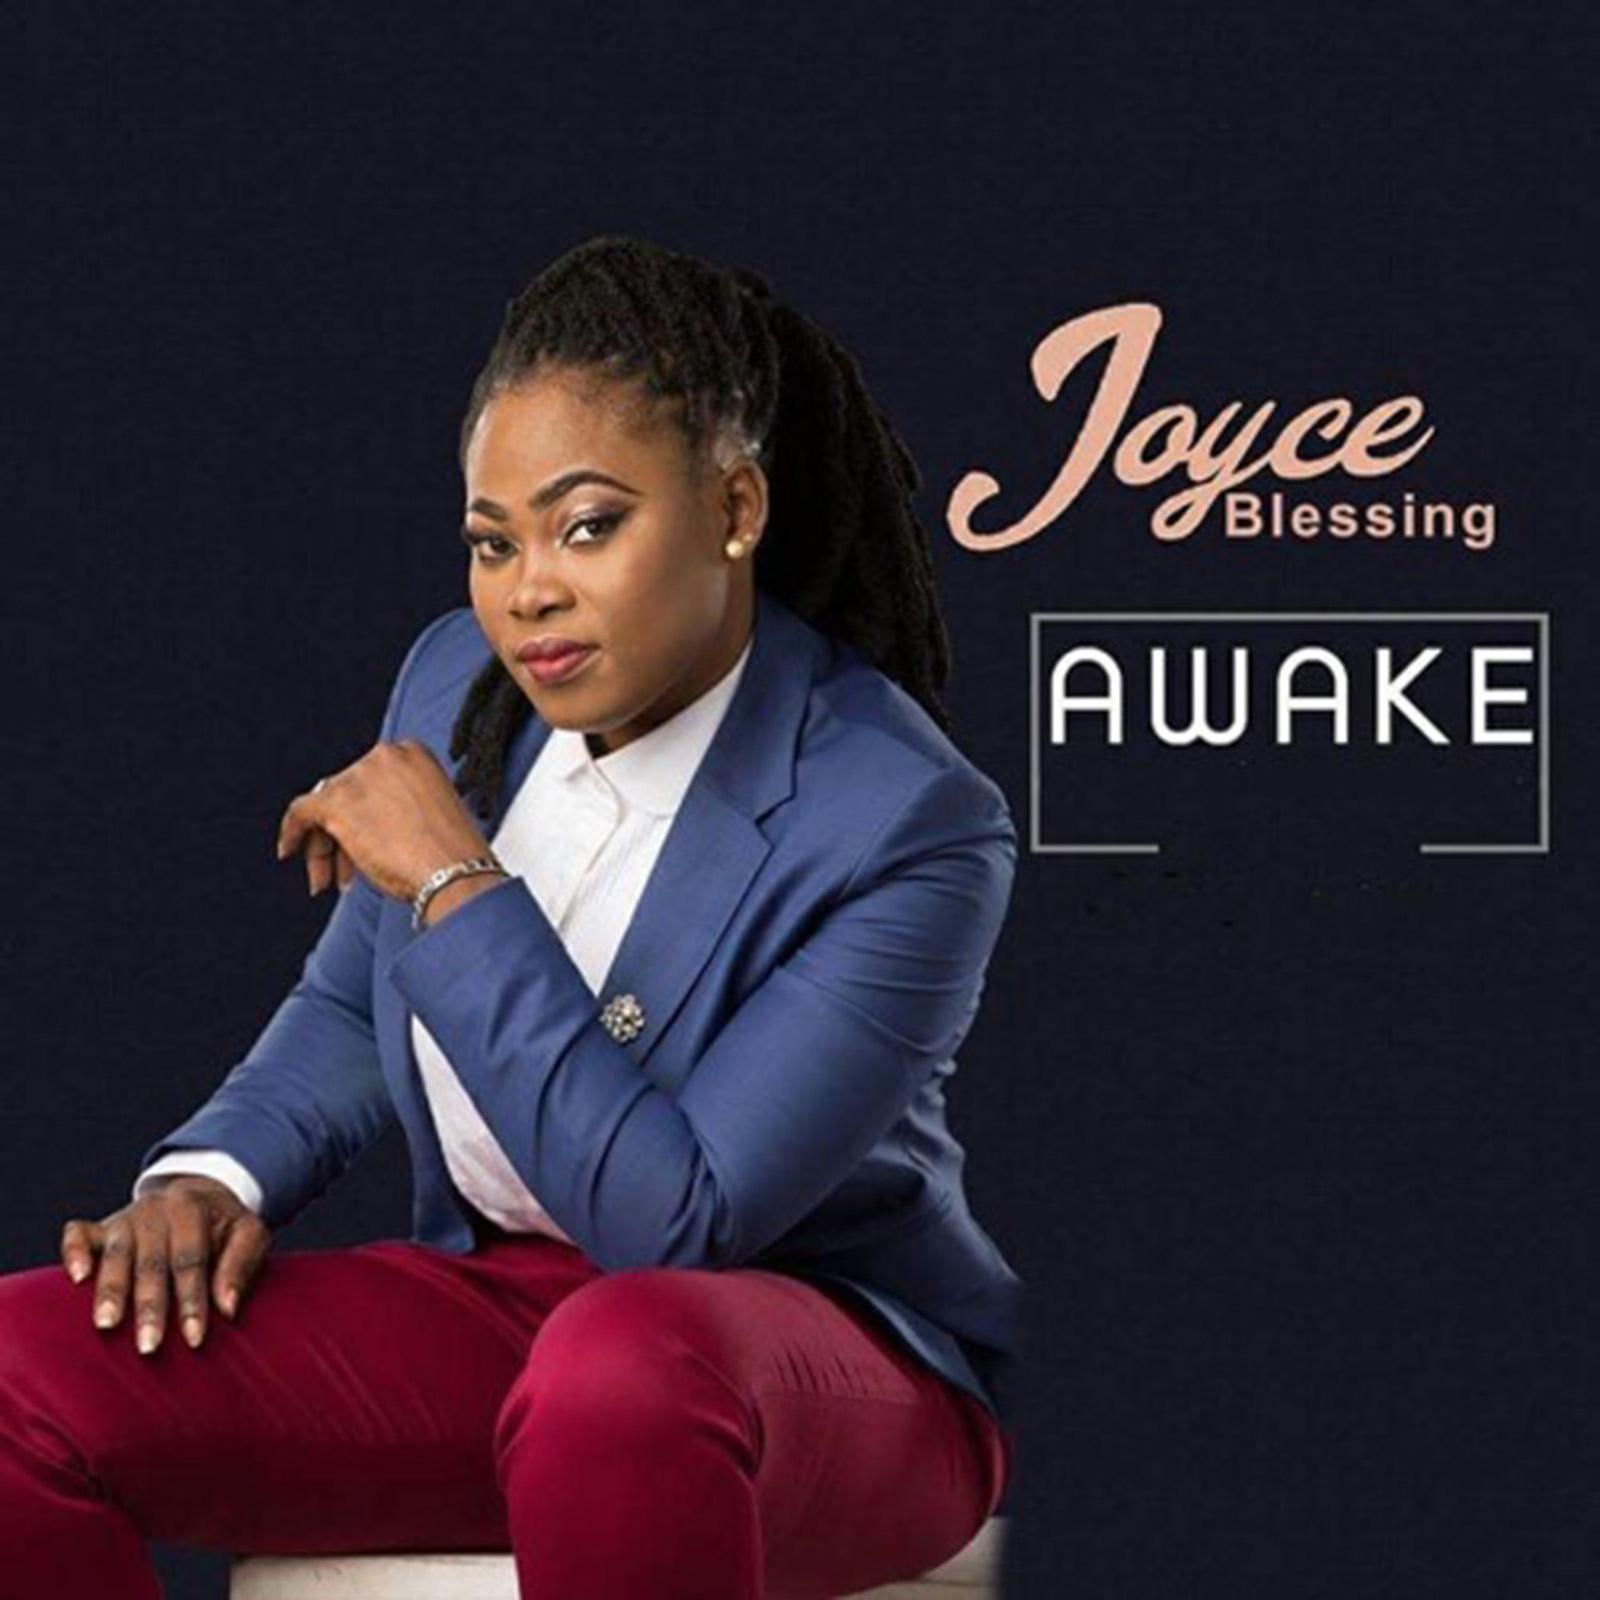 Awake by Joyce Blessing